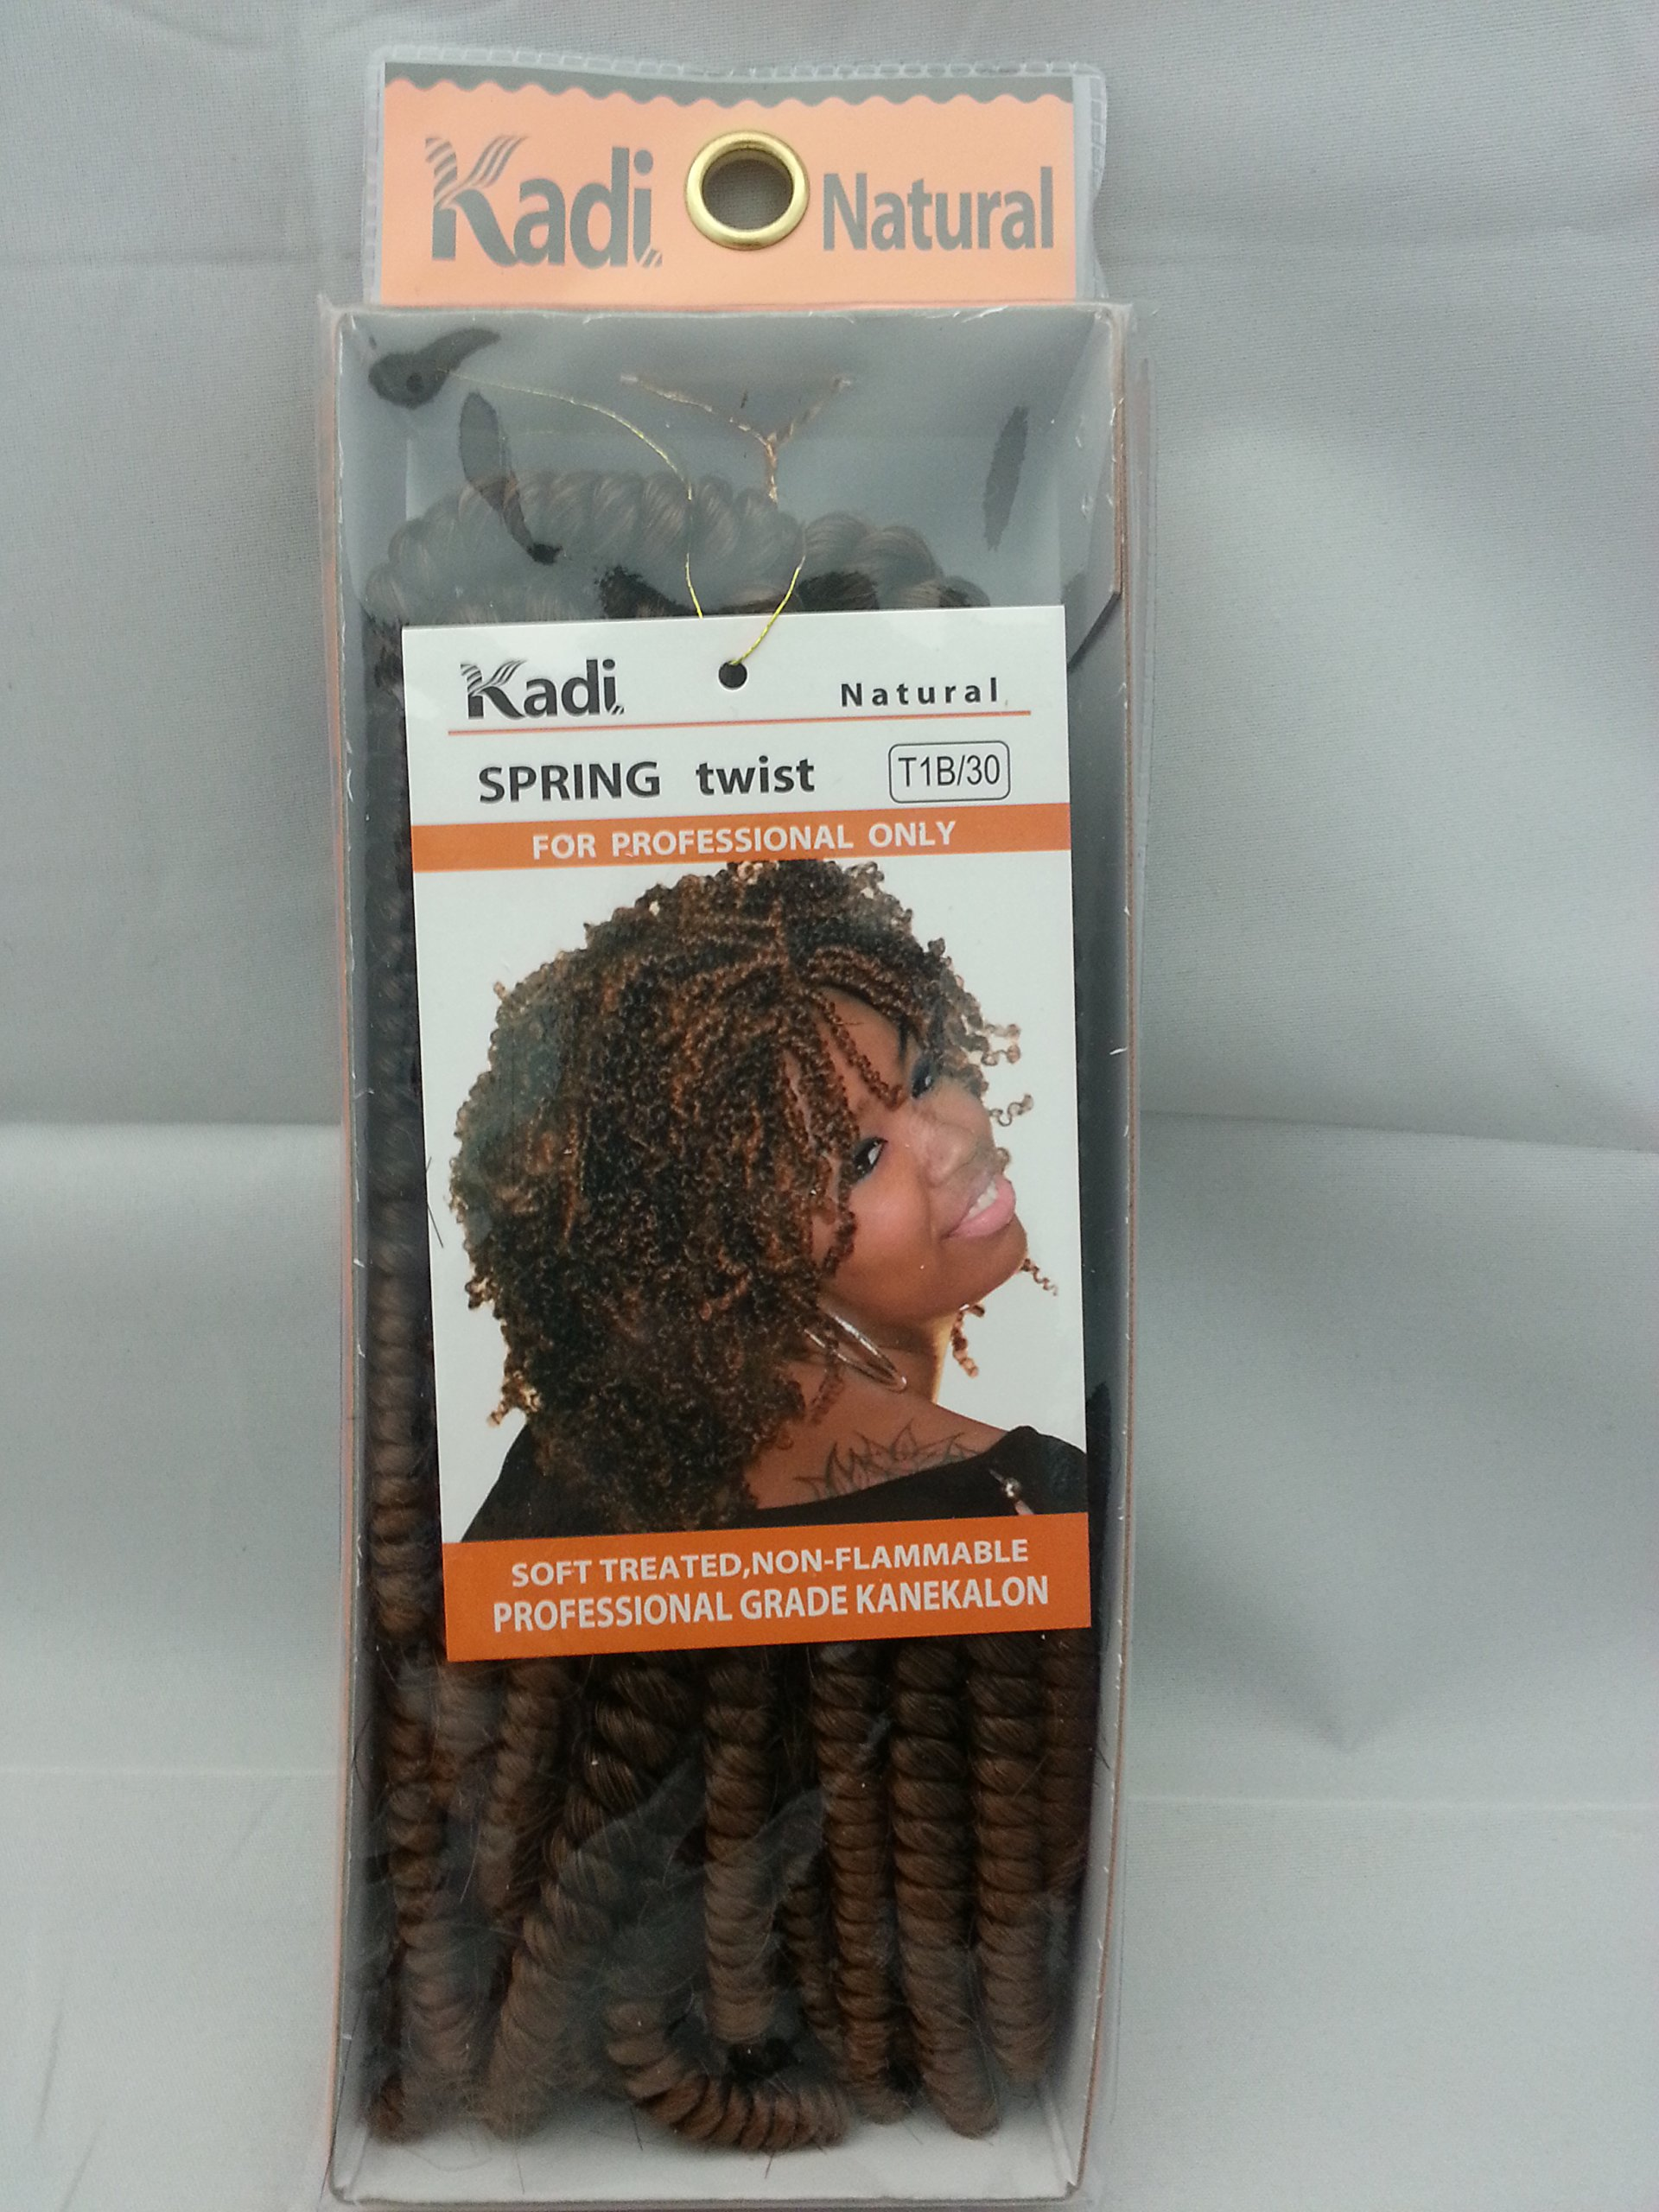 Kadi Natural Braiding Style, Hair Extension, Professional Grade Kanekalon (T1B/30 - Black/Medium Auburn, SPRING TWIST)